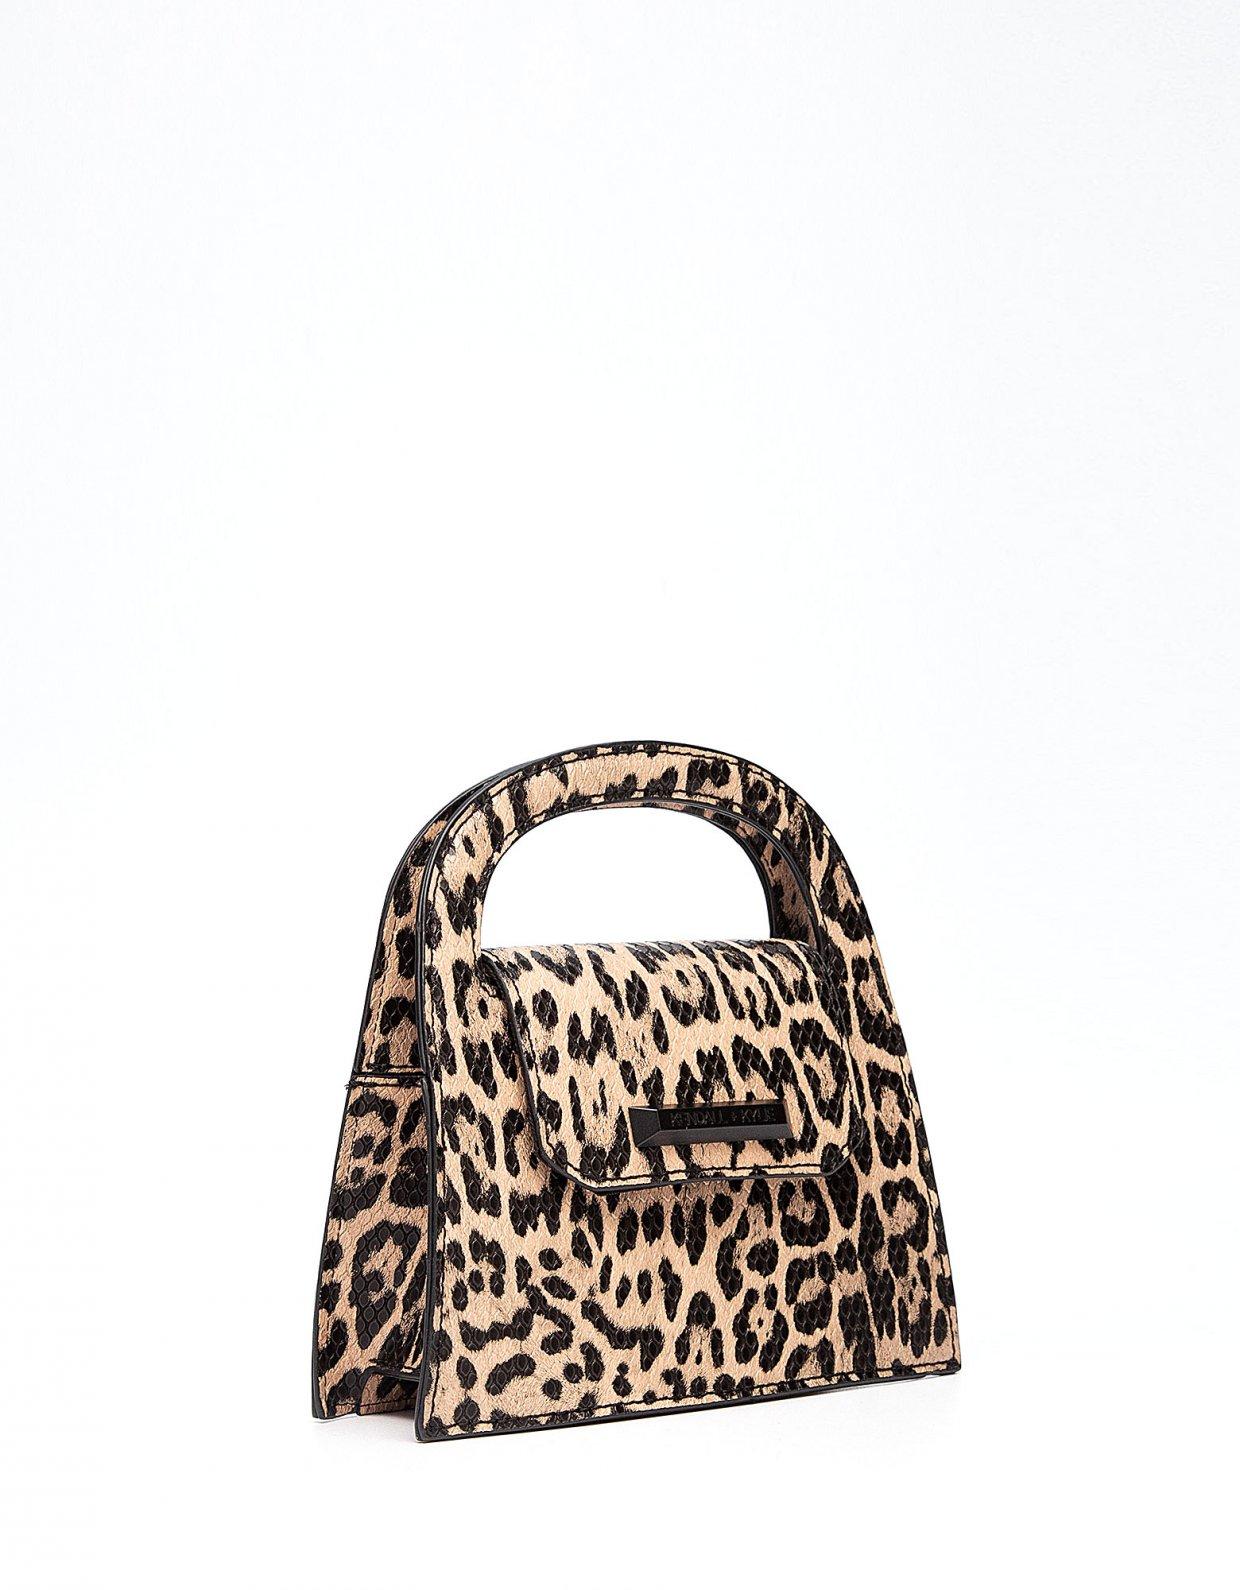 Kendall + Kylie Louisa crossbody leopard